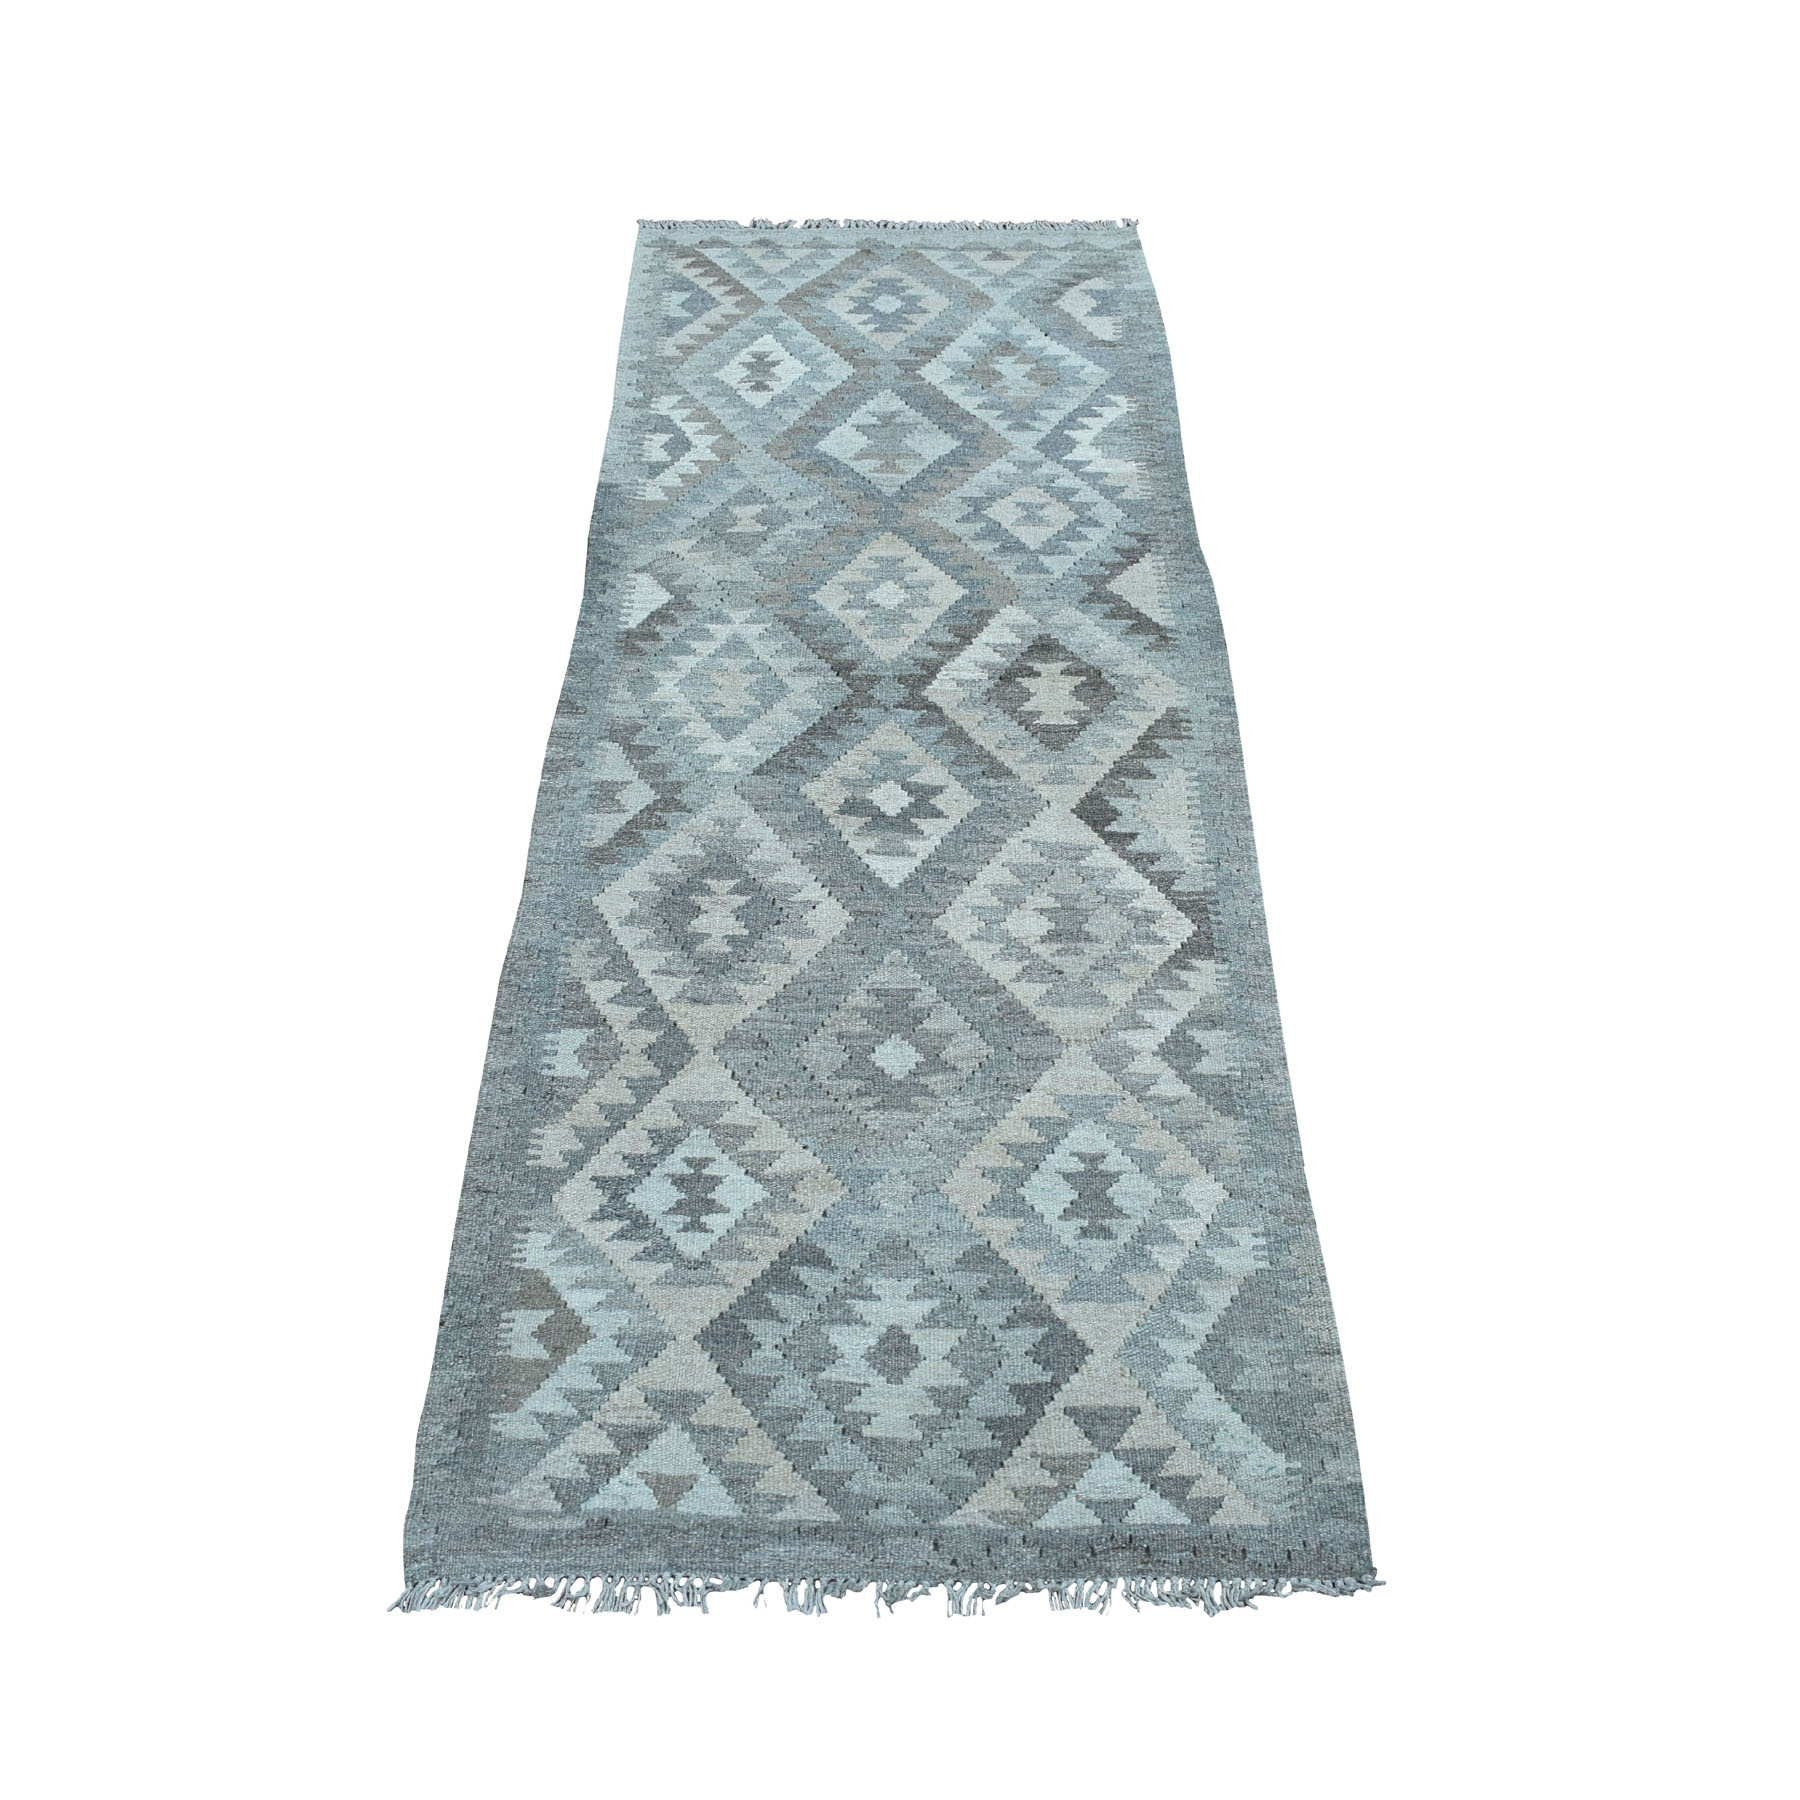 "2'5""x6'4"" Undyed Natural Wool Afghan Kilim Reversible Hand Woven Runner Oriental Rug 53077"